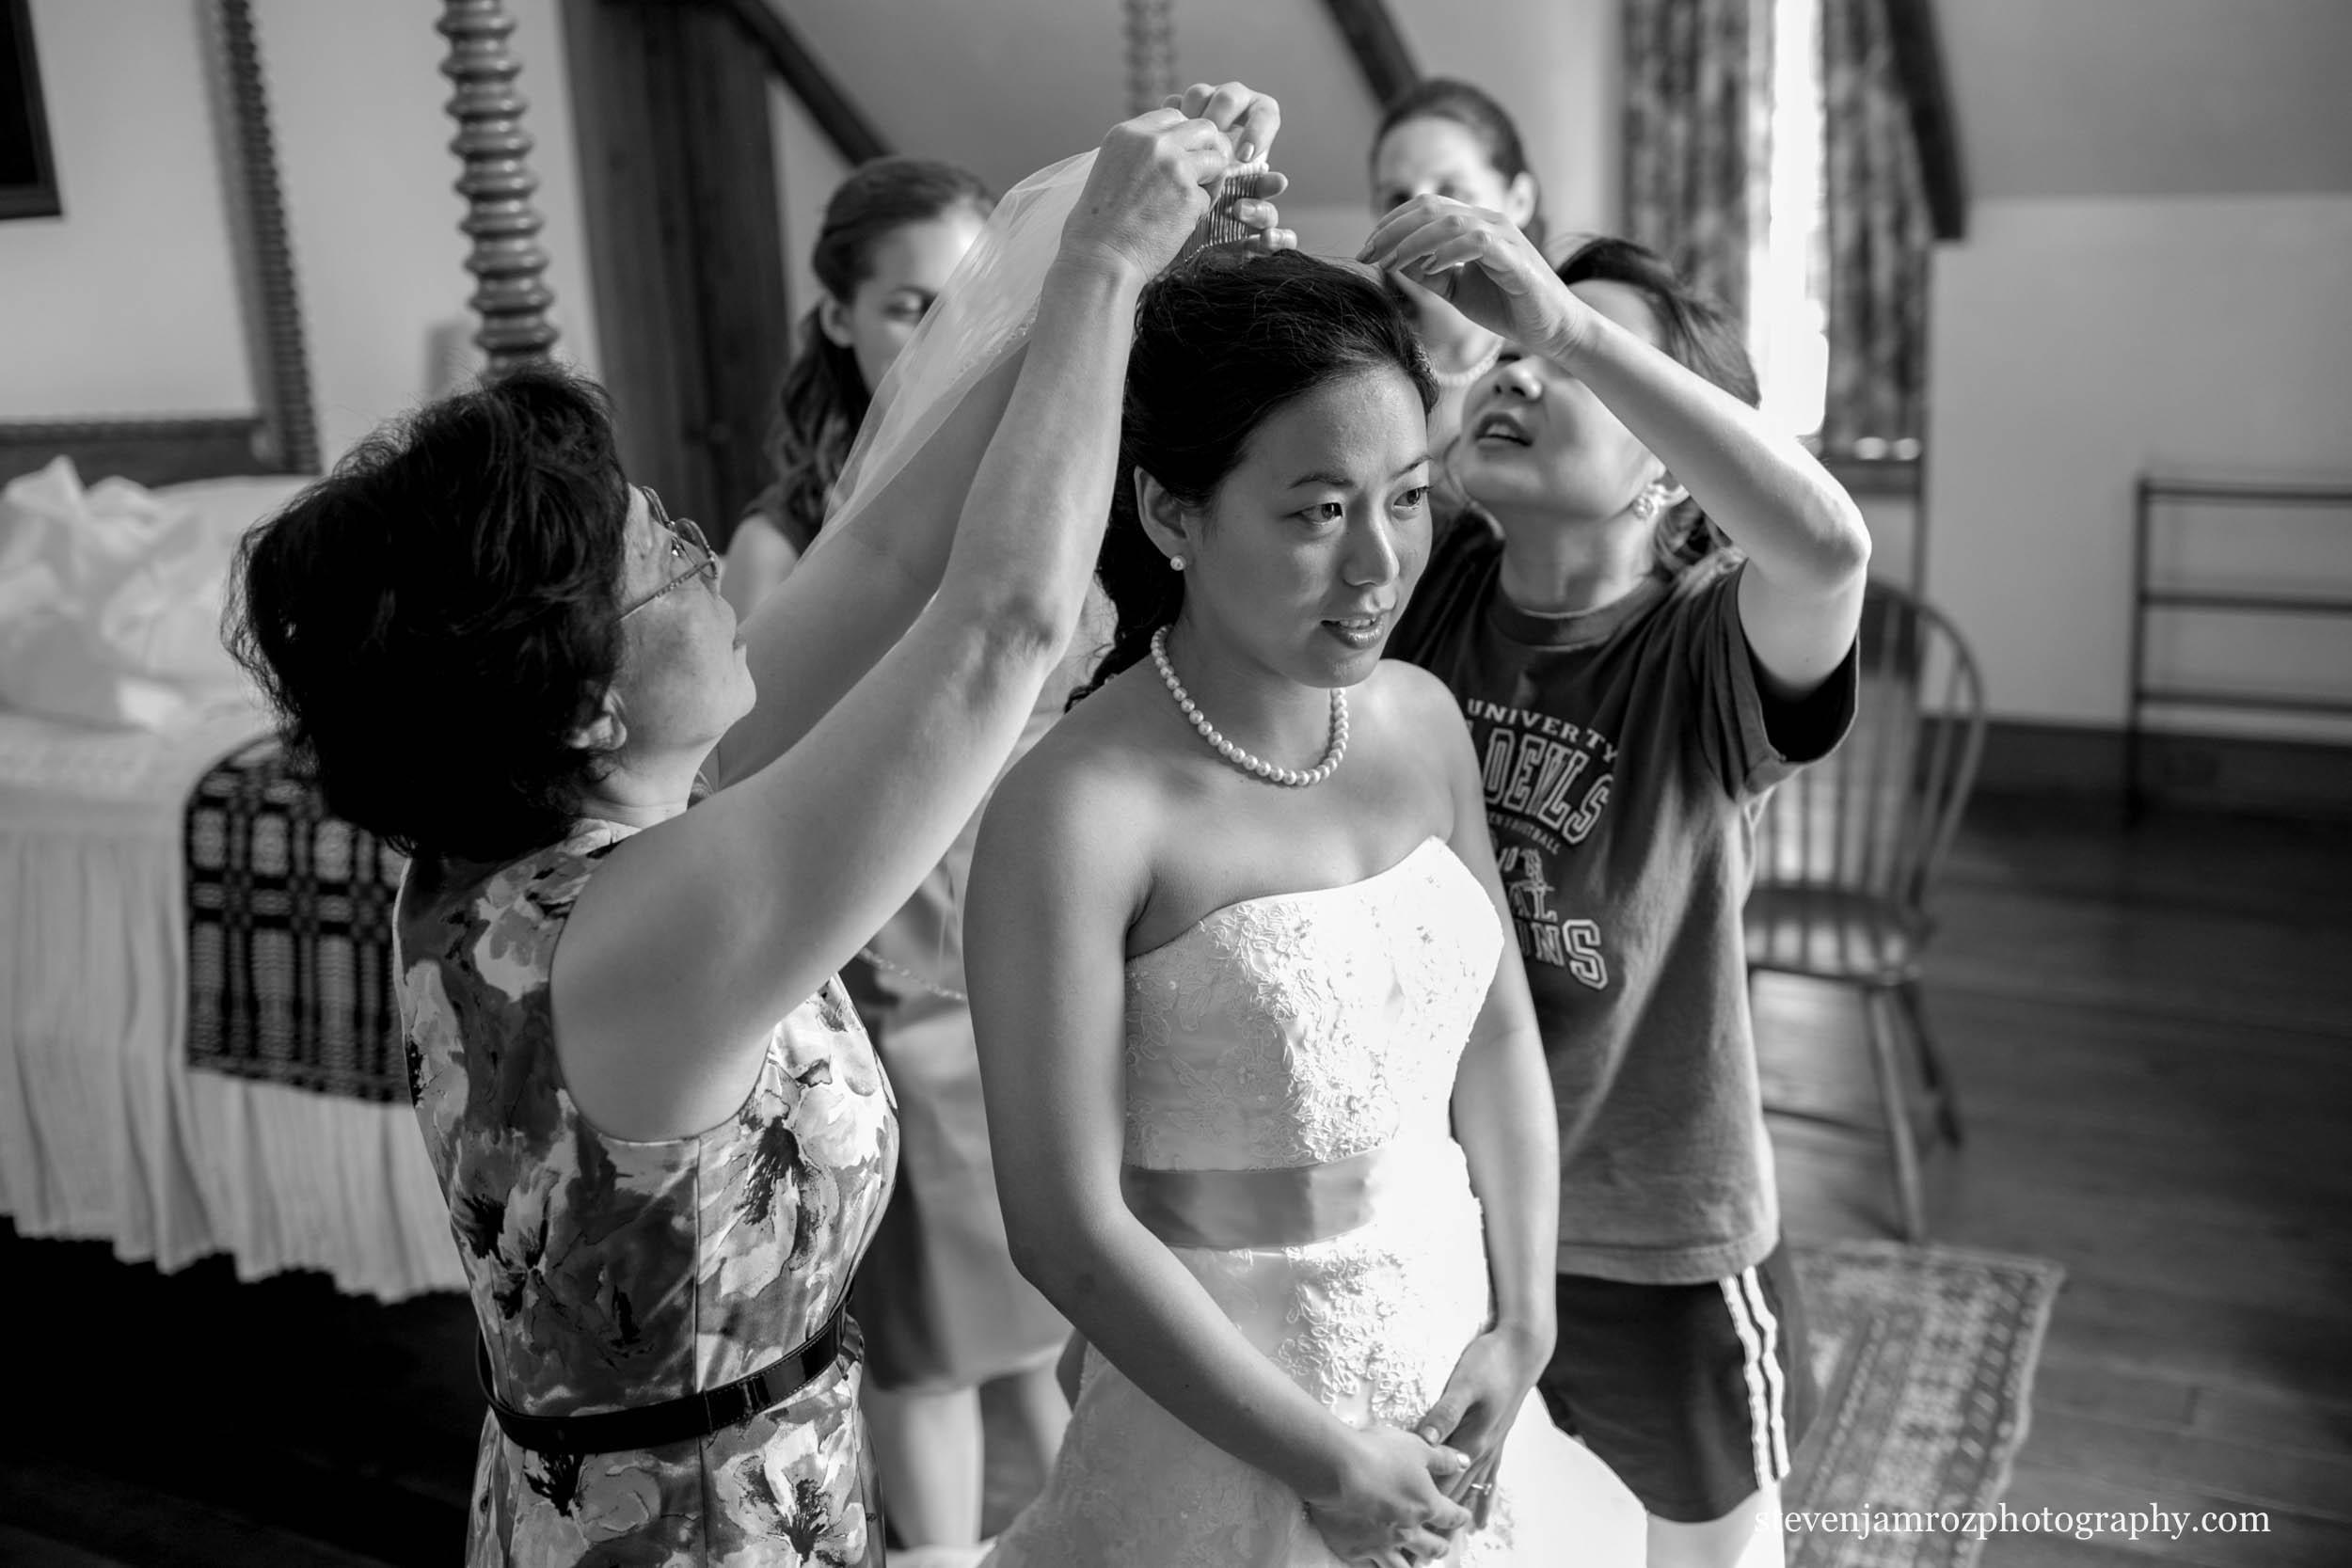 hair-stylist-bride-raleigh-wedding-steven-jamroz-photography-0090.jpg